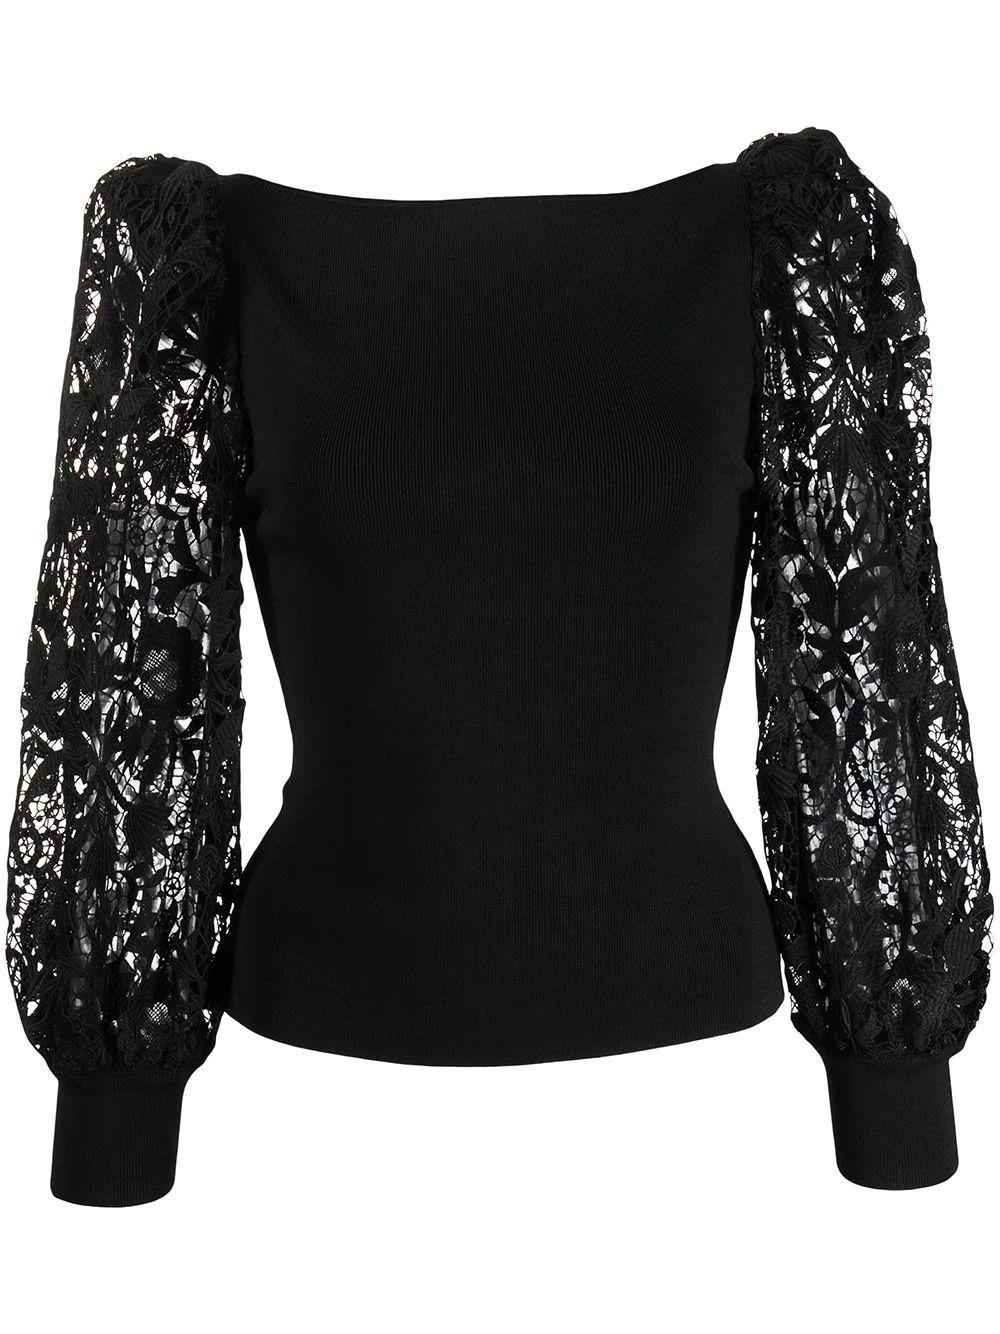 Abella Puff Sleeve Sweater Item # CC108S02711